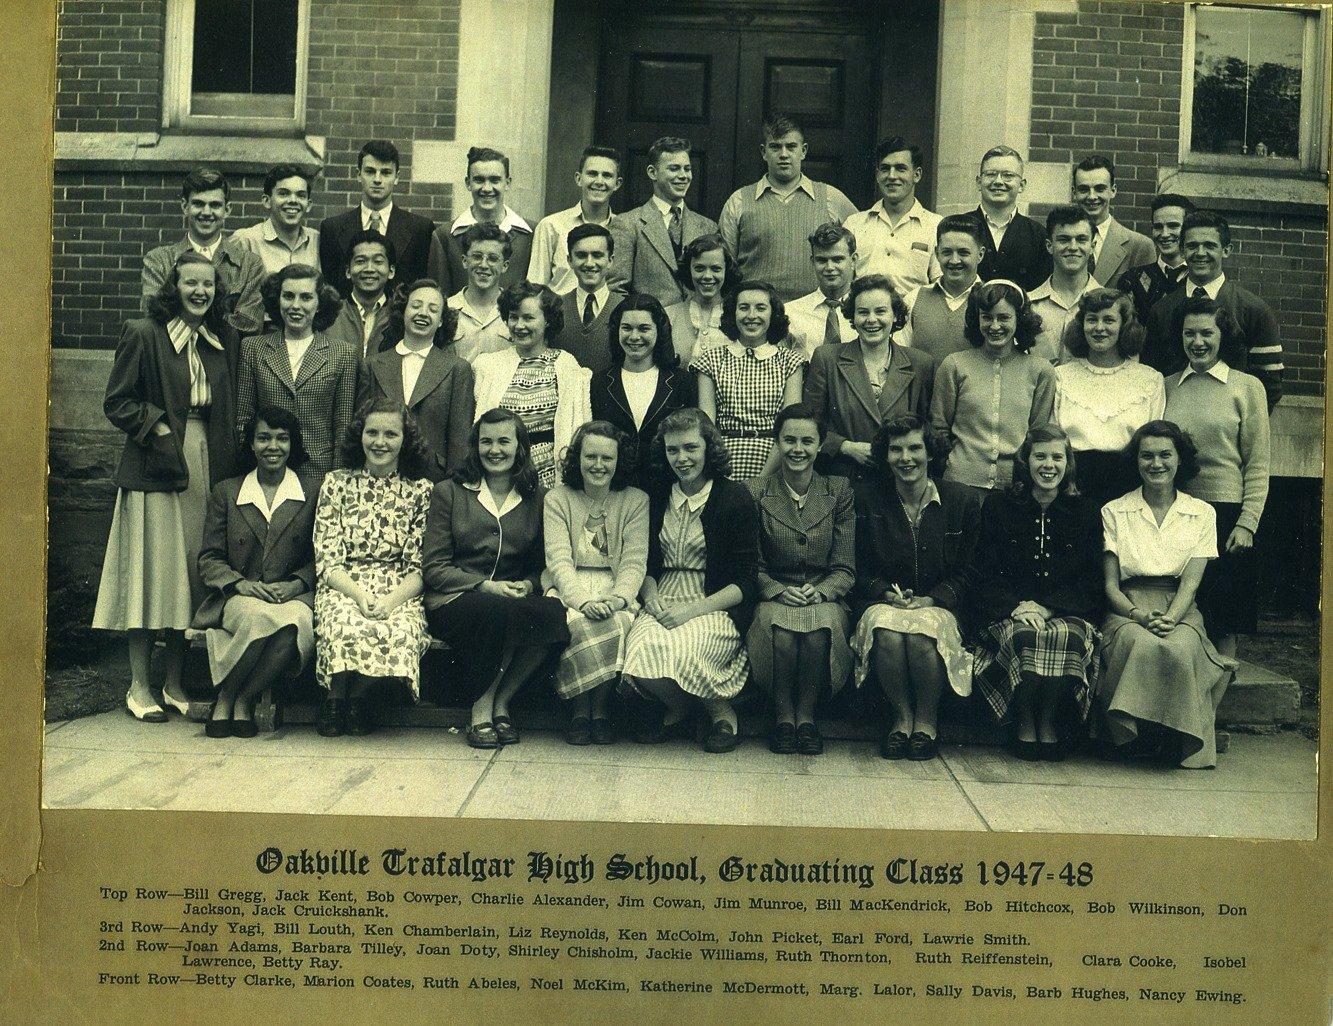 Oakville Trafalgar High School, Graduating Class, 1947-8 ...